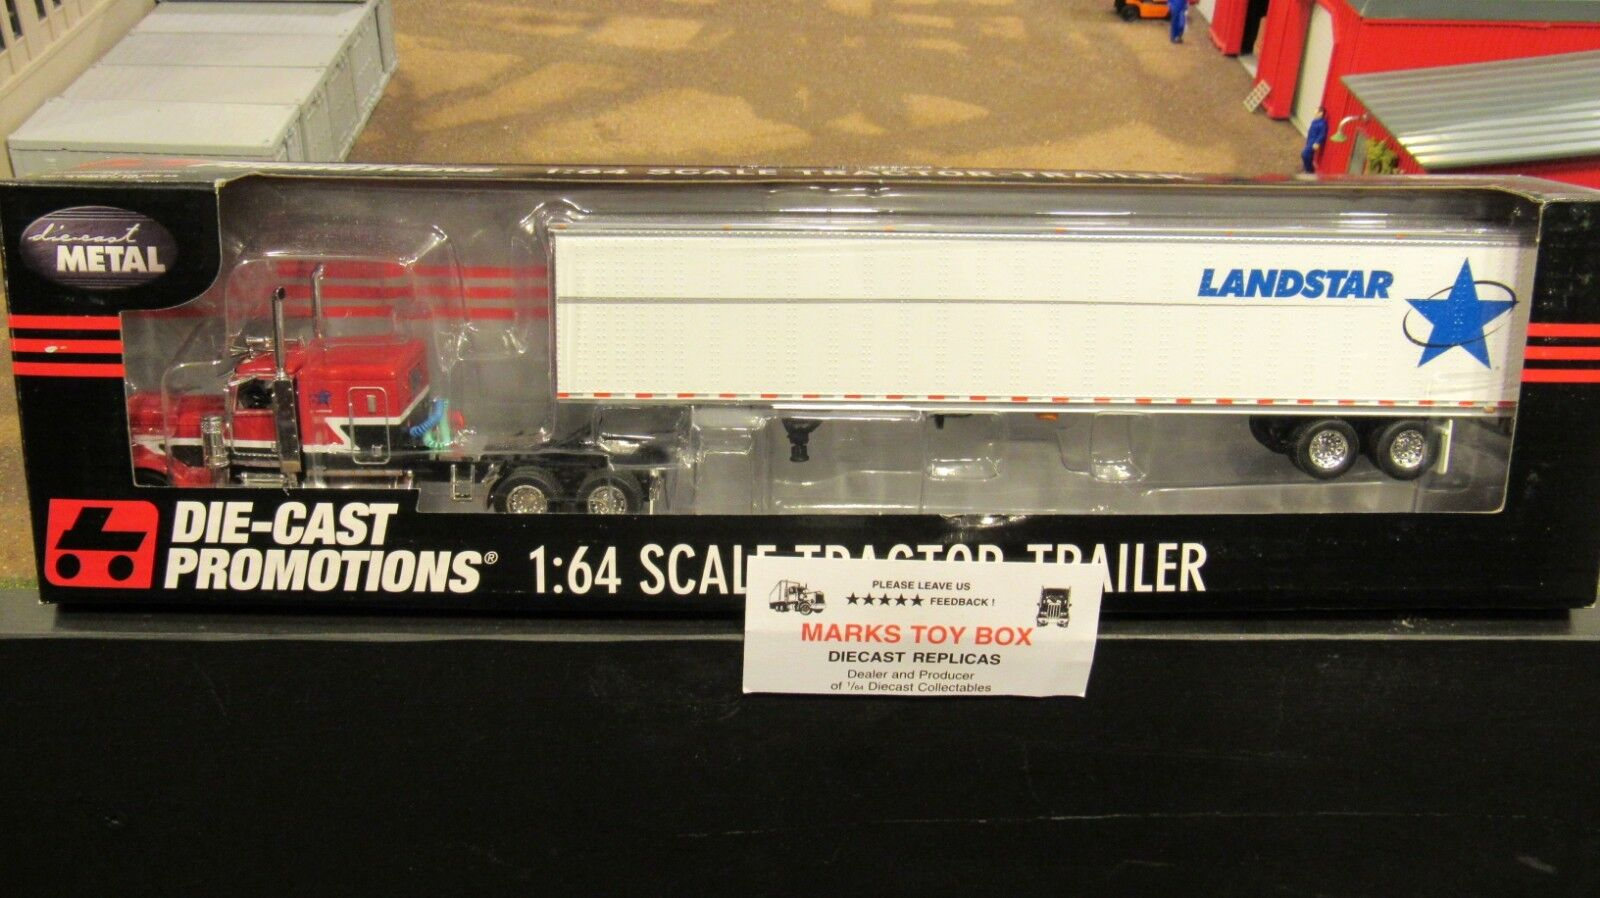 DCPLandStar camiones Pete 389 Semi Cab Truck Dry Van Trailer 1 64 cl